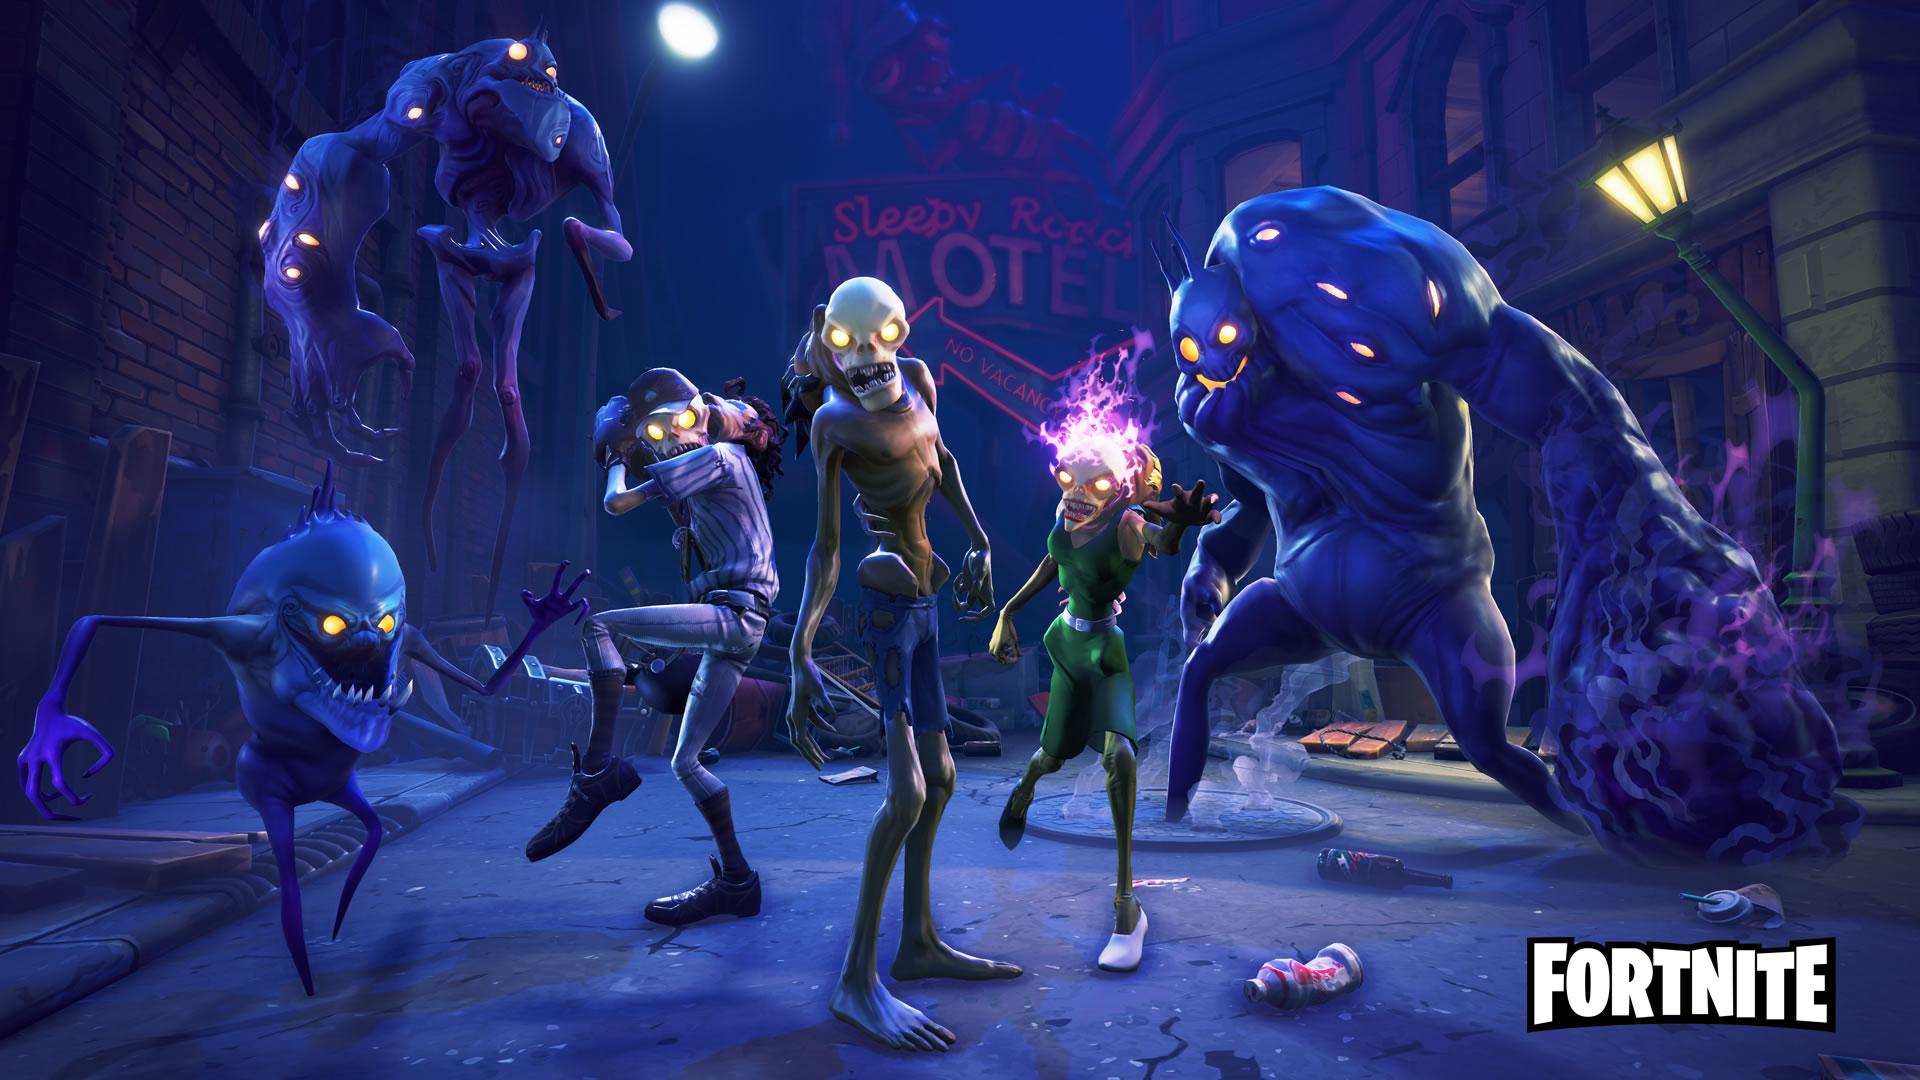 download wallpaper: Fortnite Monsters wallpaper